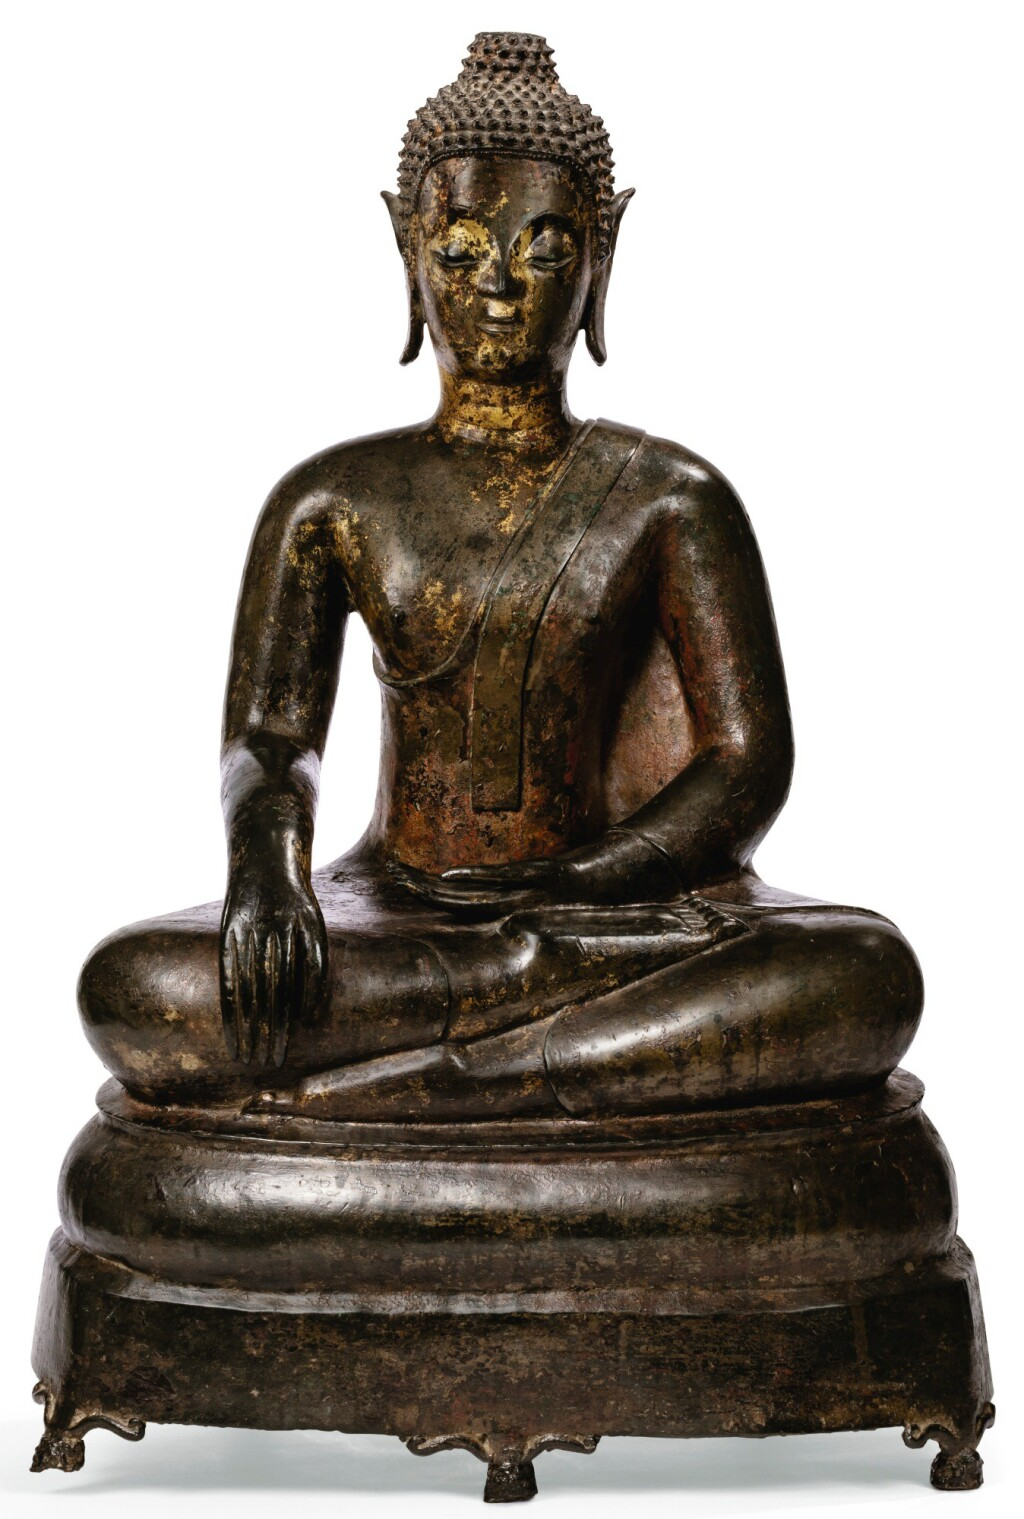 STATUE DE BOUDDHA SHAKYAMUNI EN BRONZE DORÉ THAÏLANDE, STYLE D'AYUTTHAYA, XVIIE SIÈCLE | 暹邏 十七世紀 銅阿瑜陀耶較式釋迦牟尼佛坐像 | A gilt bronze figure of seated Buddha Shakyamuni, Thailand, Ayutthaya style, 17th century